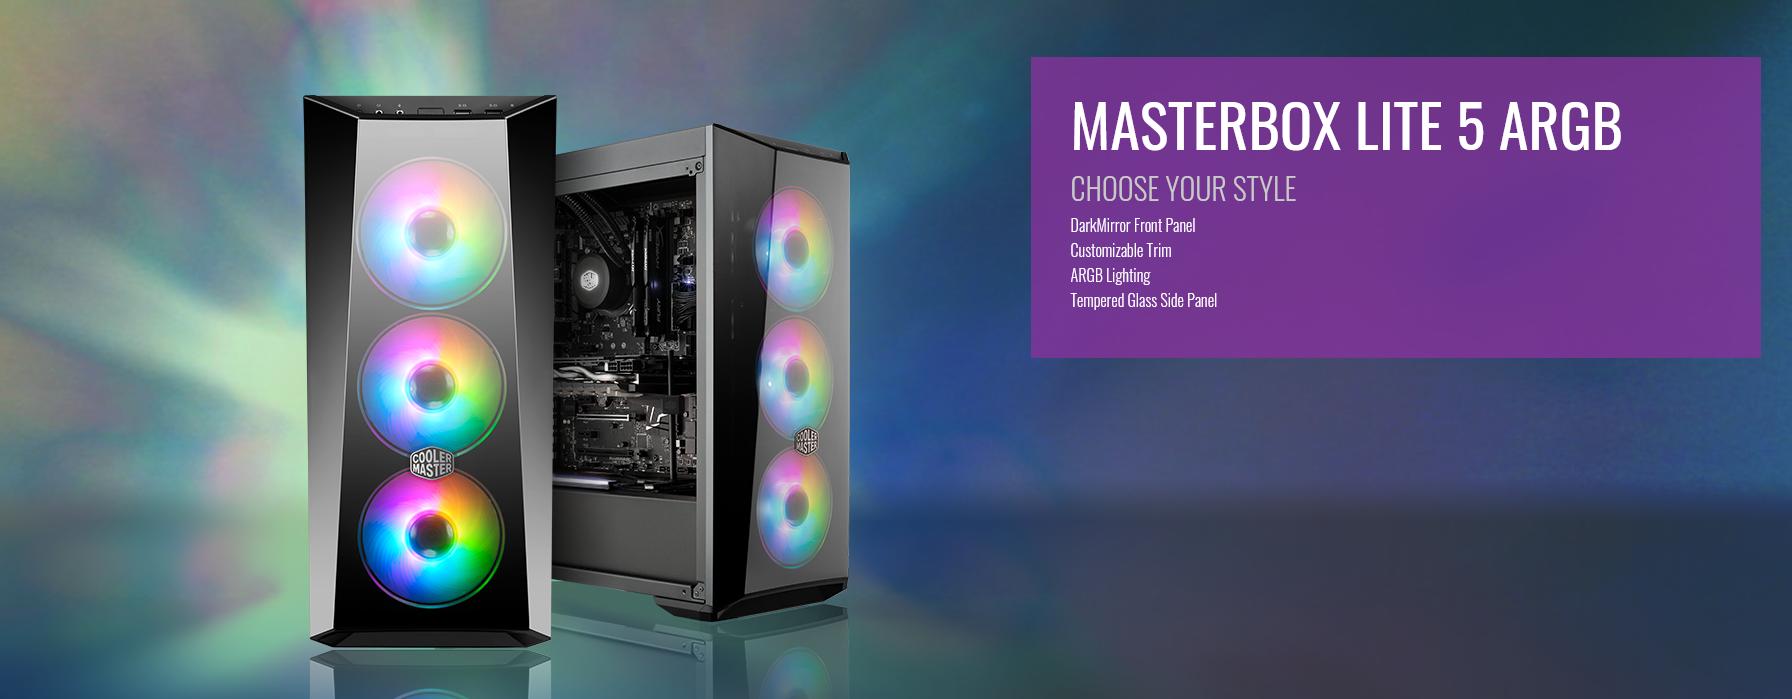 Case Cooler Master MasterBox Lite 5 ARGB (Mid Tower/Màu đen/Led ARGB giới thiệu